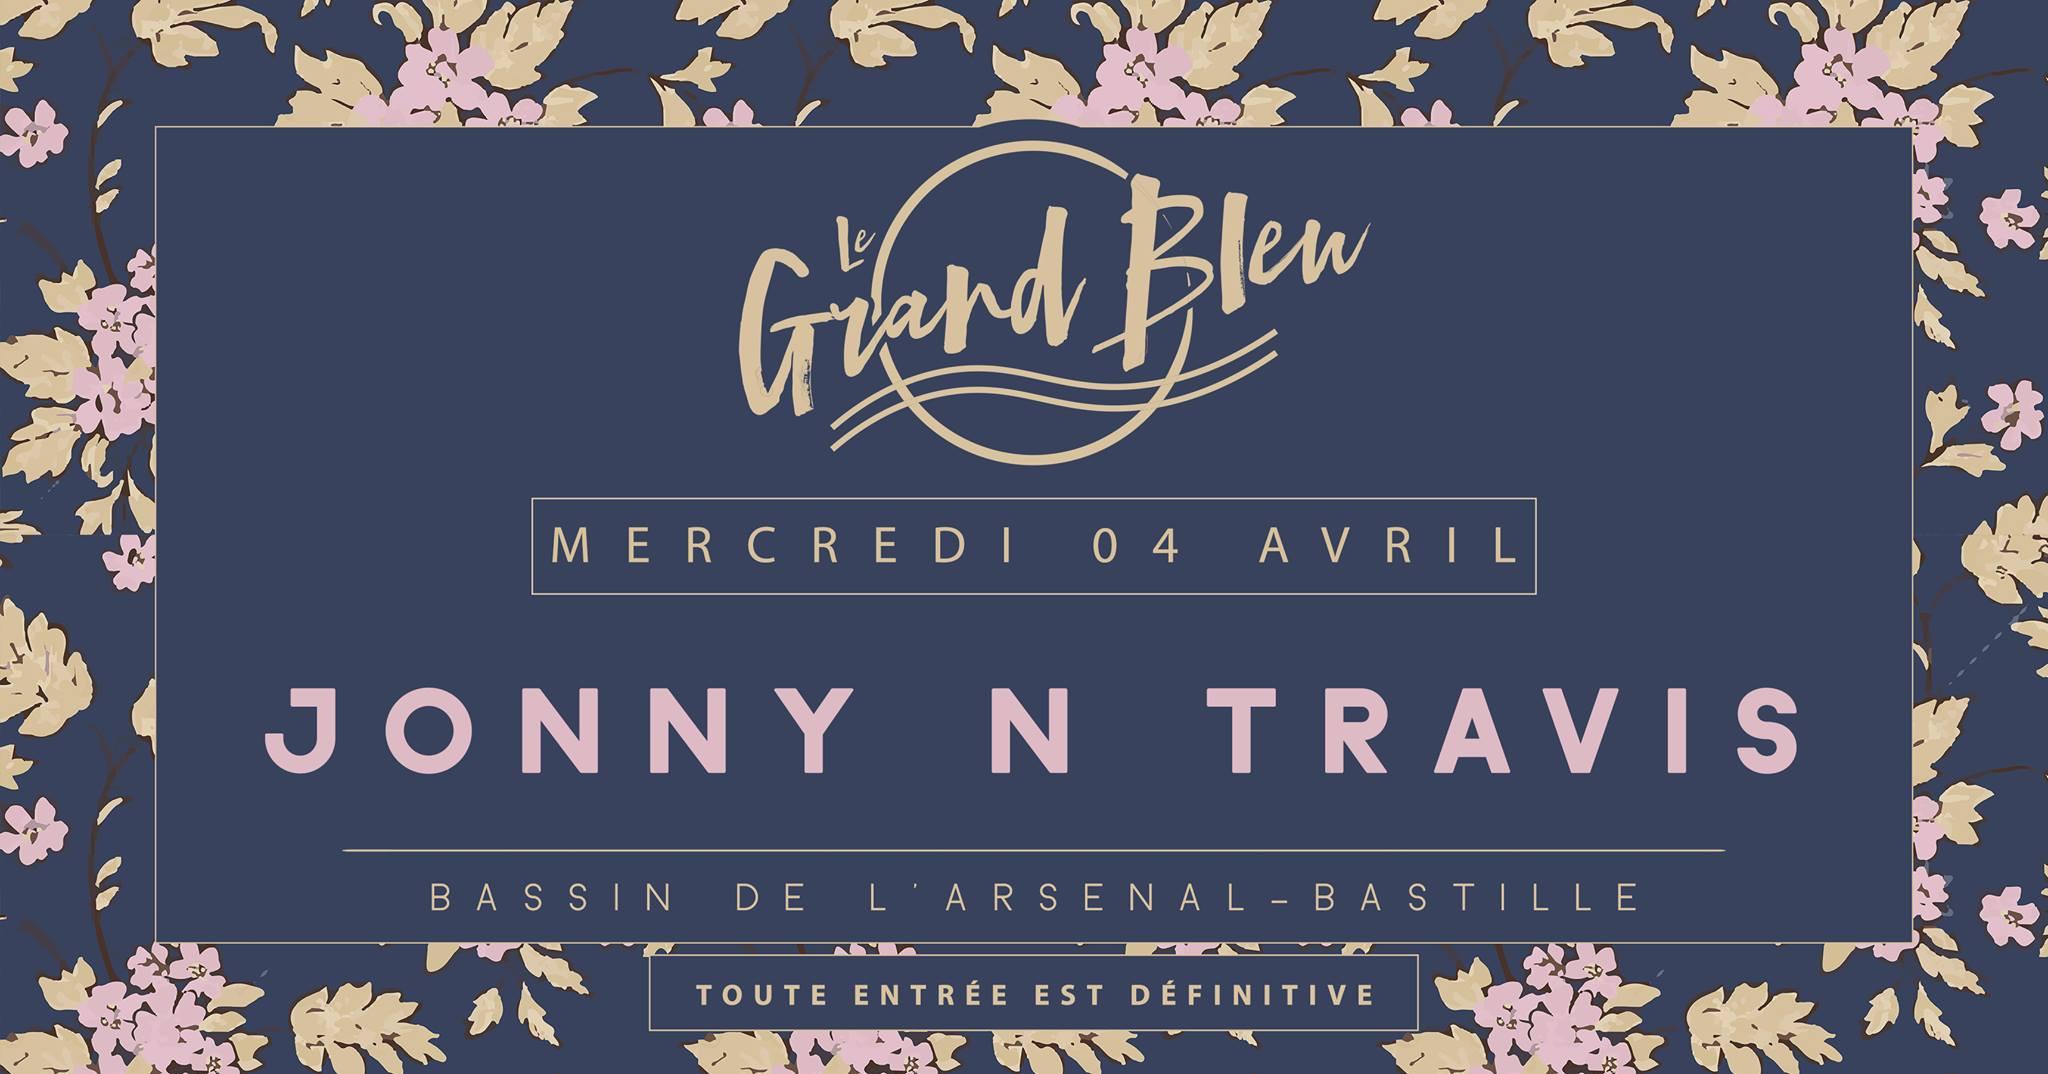 Jonny n Travis - @Grand Bleu